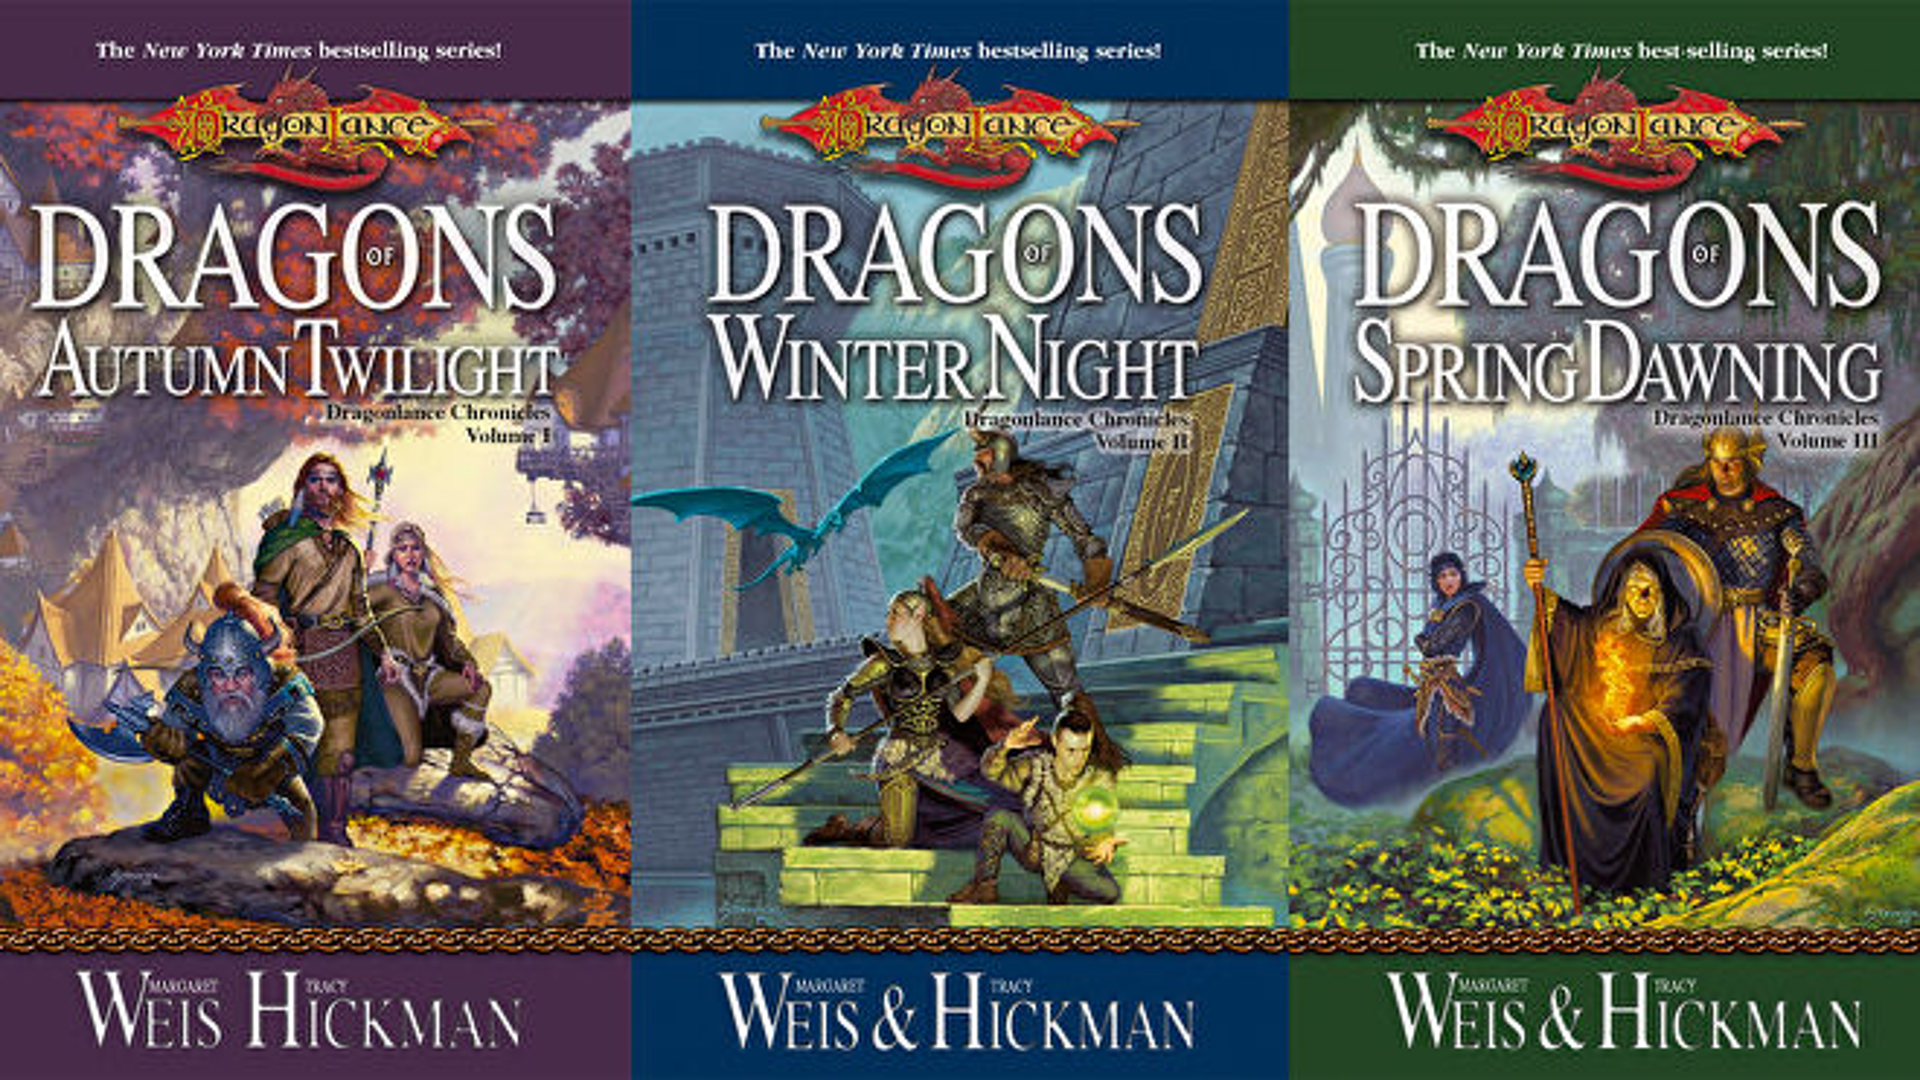 dragonlance-dnd-trilogy-covers.jpg